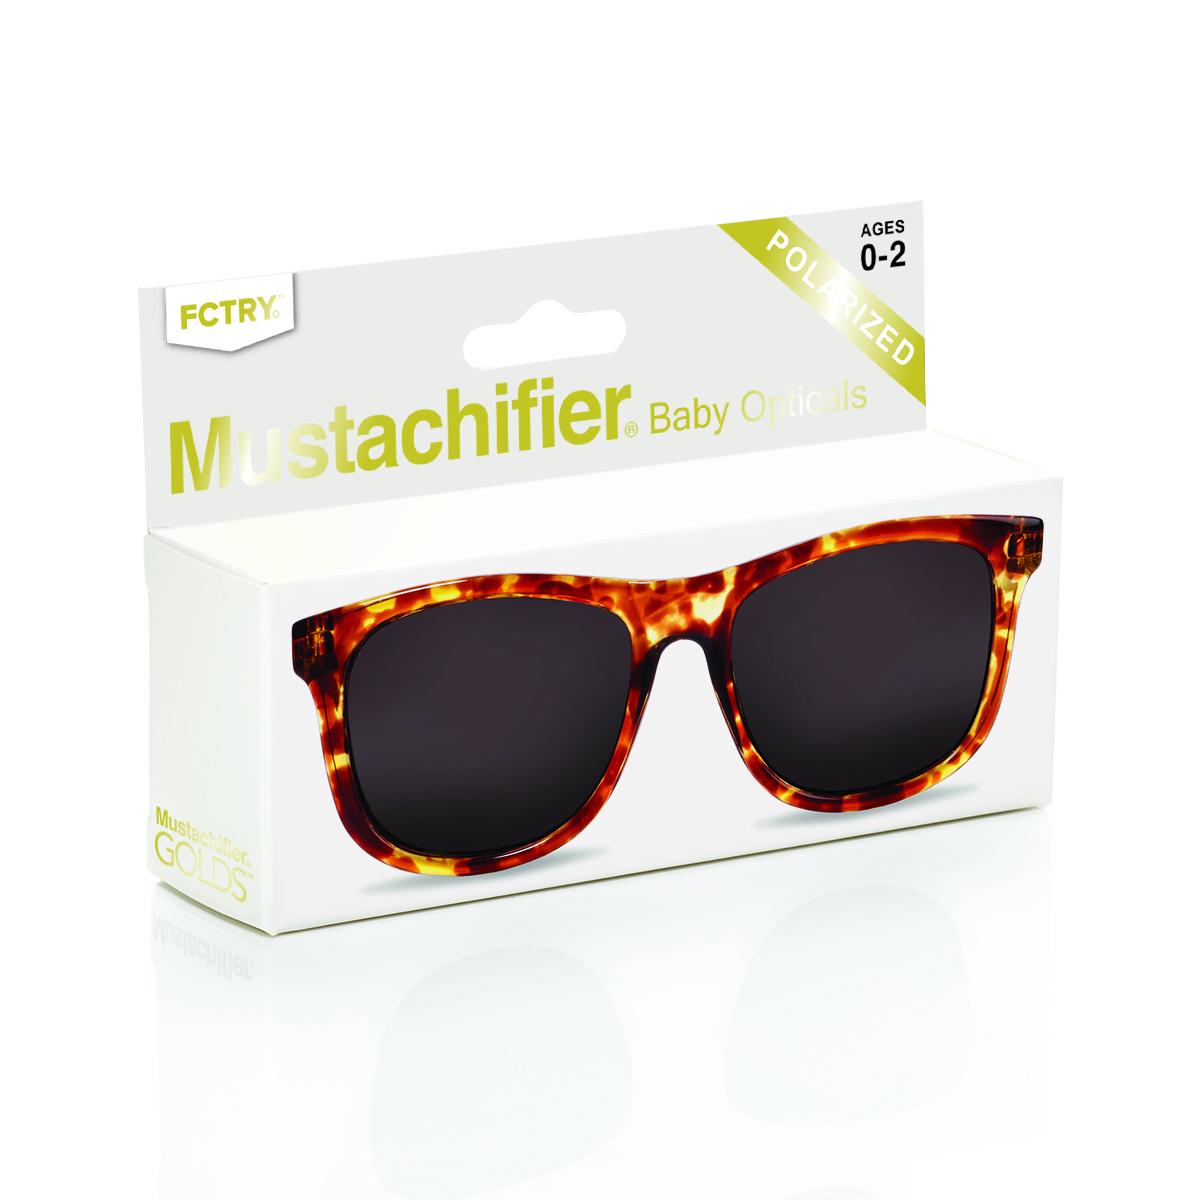 Mustachifier Tortoise Sunglasses Age 0-2 แว่นกันแดดลายกระ